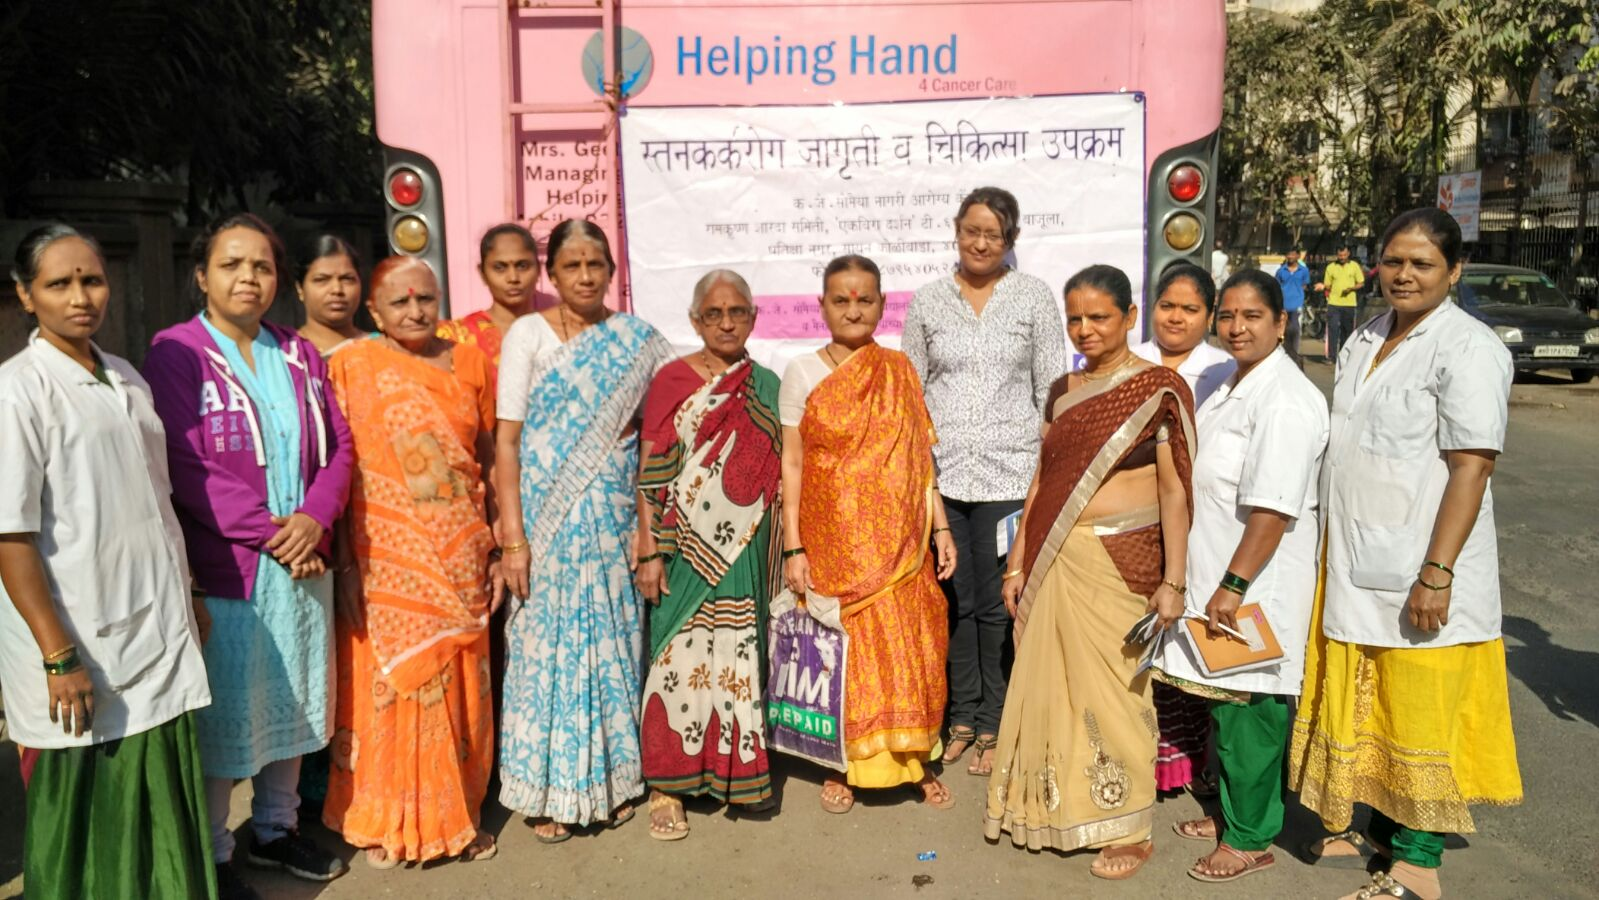 Mammography camp was held in Pratiksha Nagar on January 20, 2016 in Sion Koliwada.